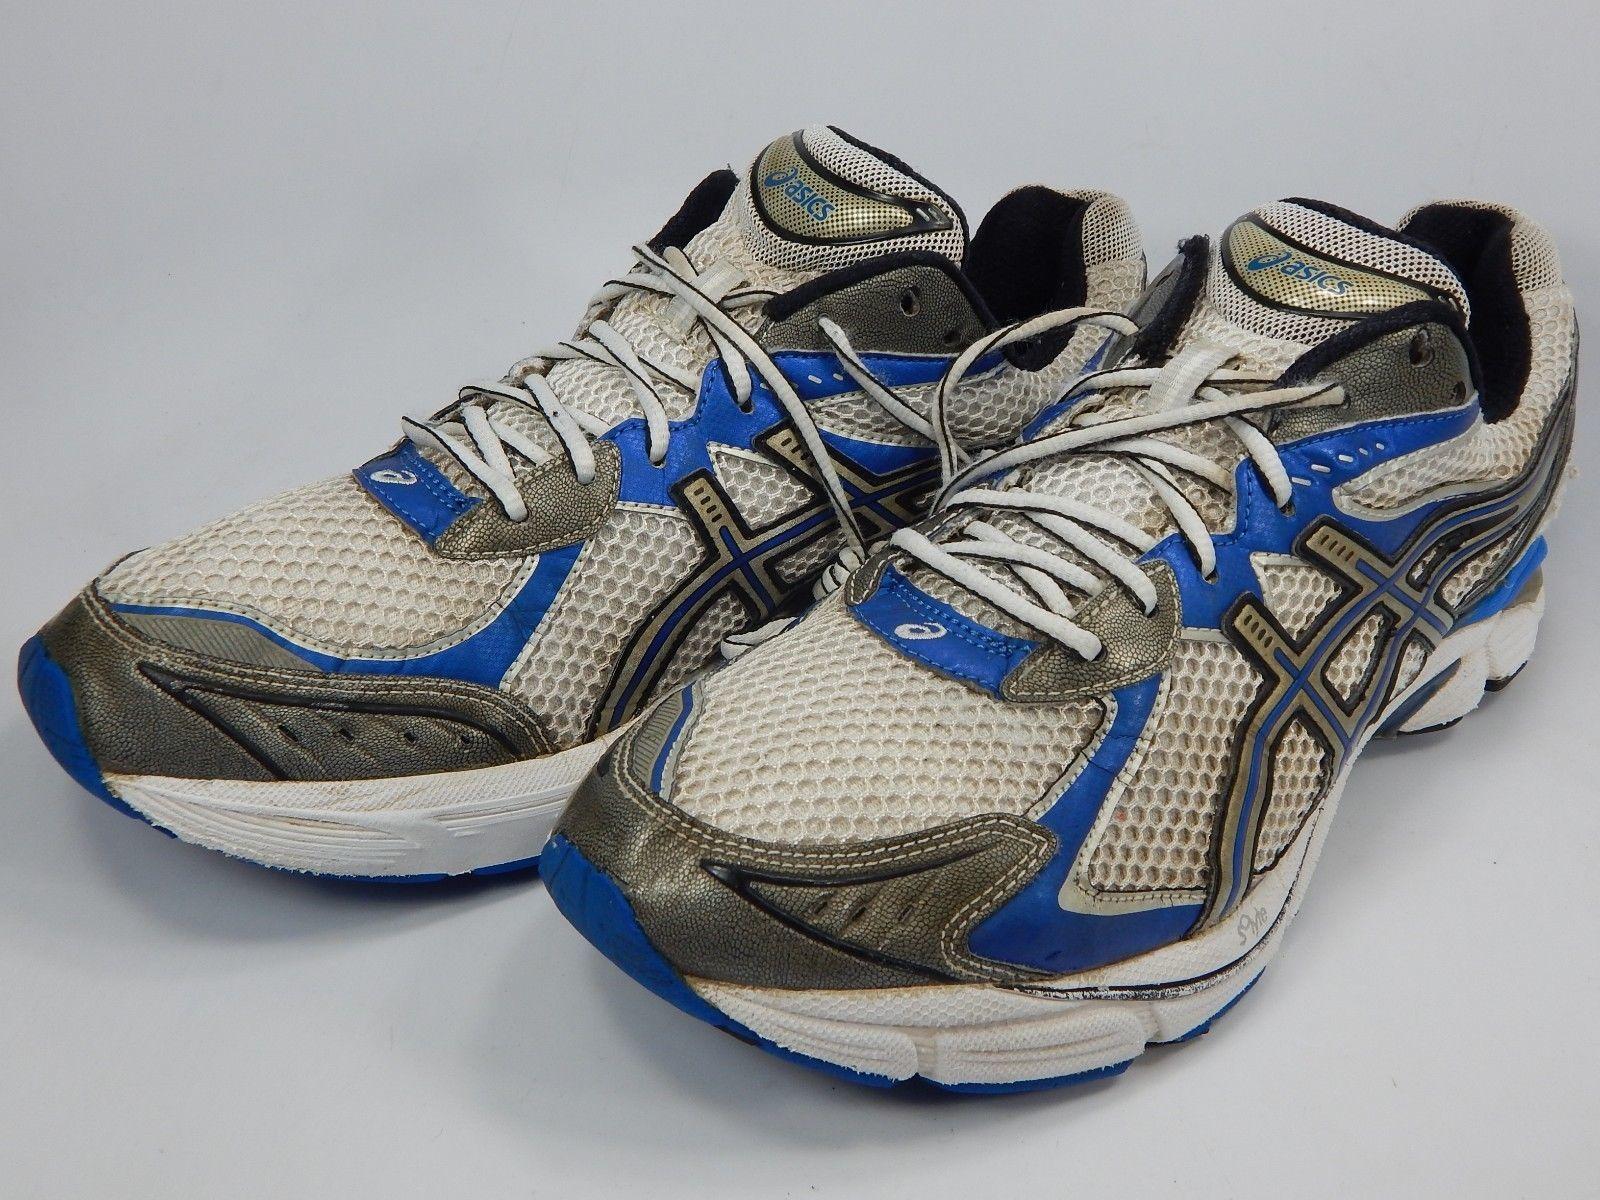 ASICS Men's GT 2160 Running Shoe Coupon Codes & Discount Deals